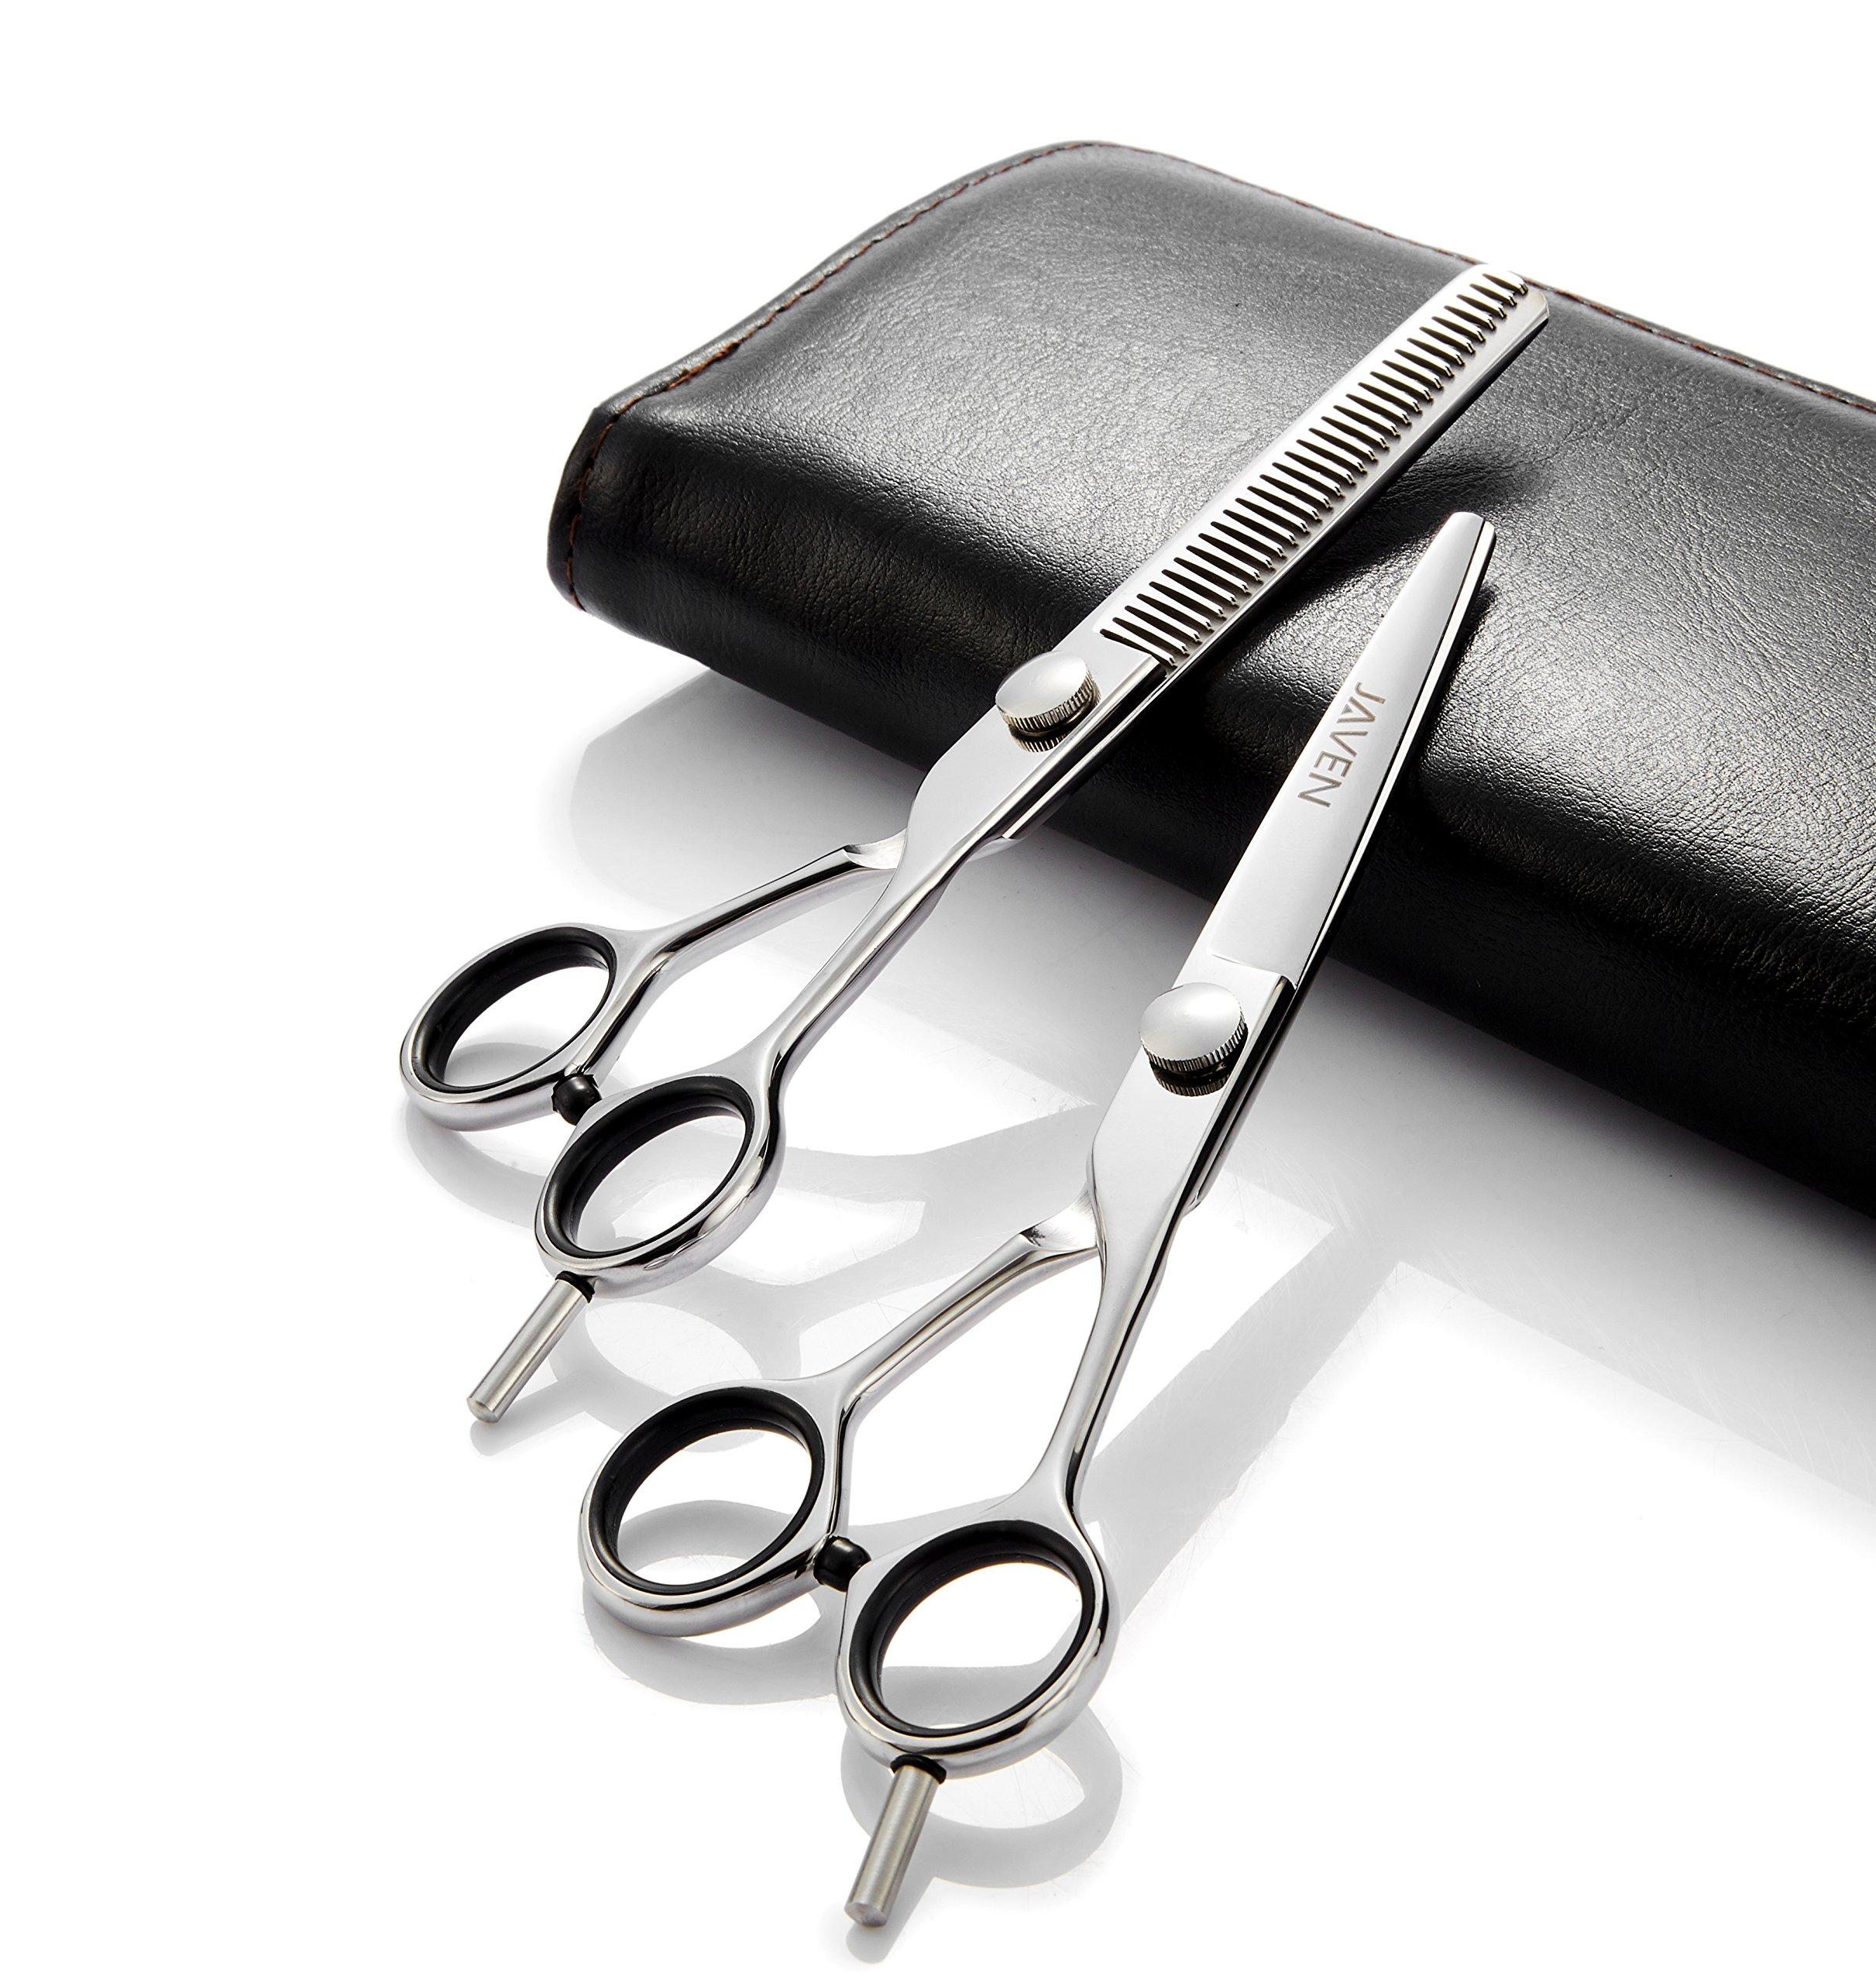 2018 Professional Hair Cutting Scissors Set,Japanese 6.5 Inch Hair Scissors Teflon Shears Hairdressing Scissors Barber Thinning Scissors Hairdresser Razor Edge Haircut Right hand use by JAVENPROLIU (Image #2)